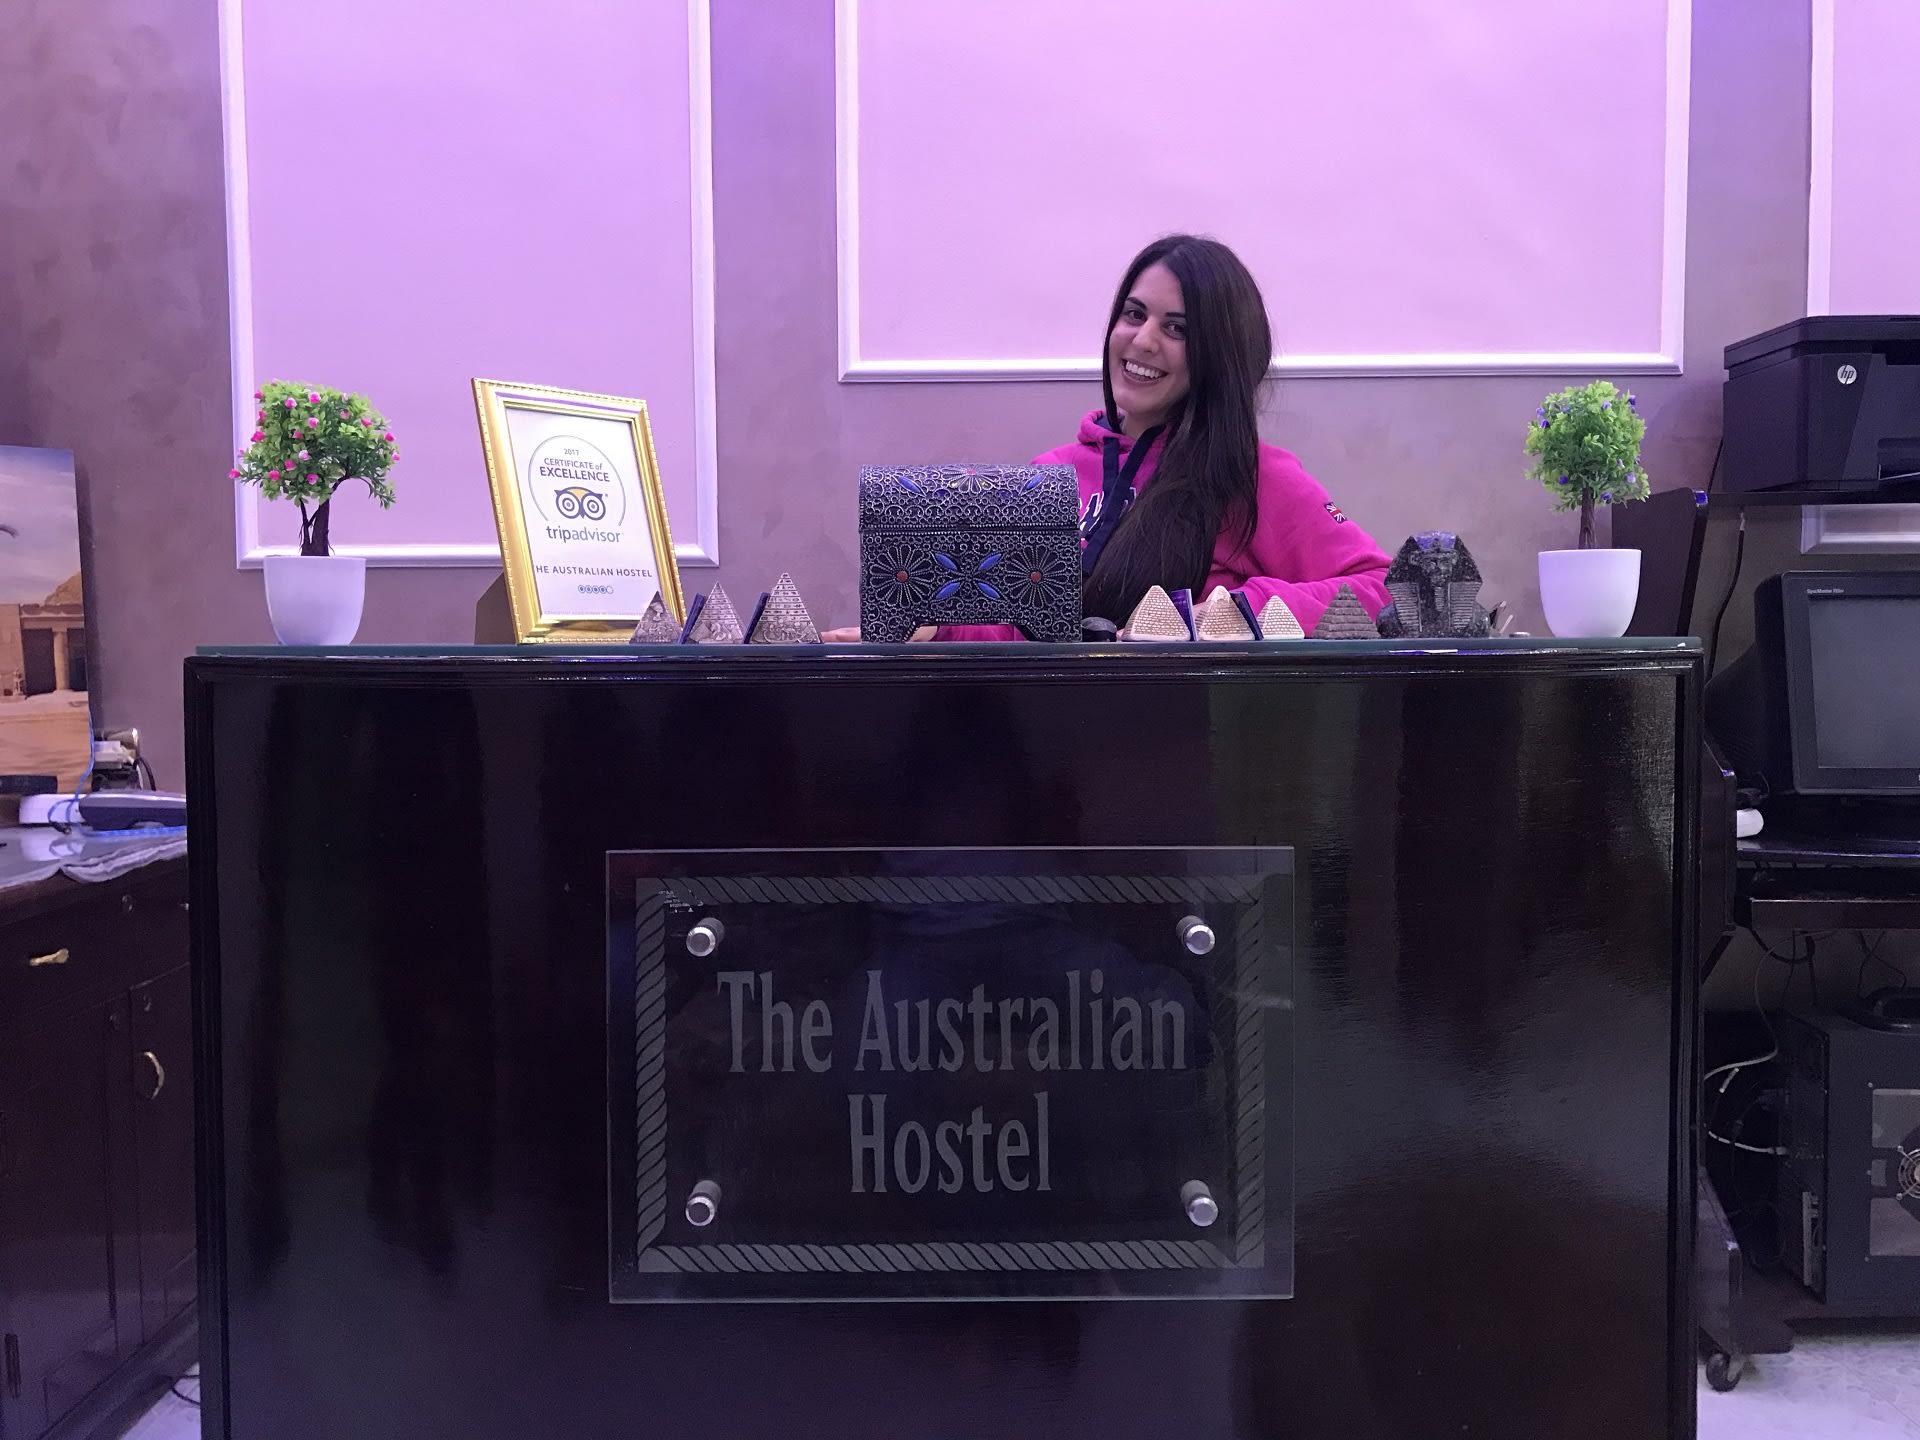 The Australian Hostel